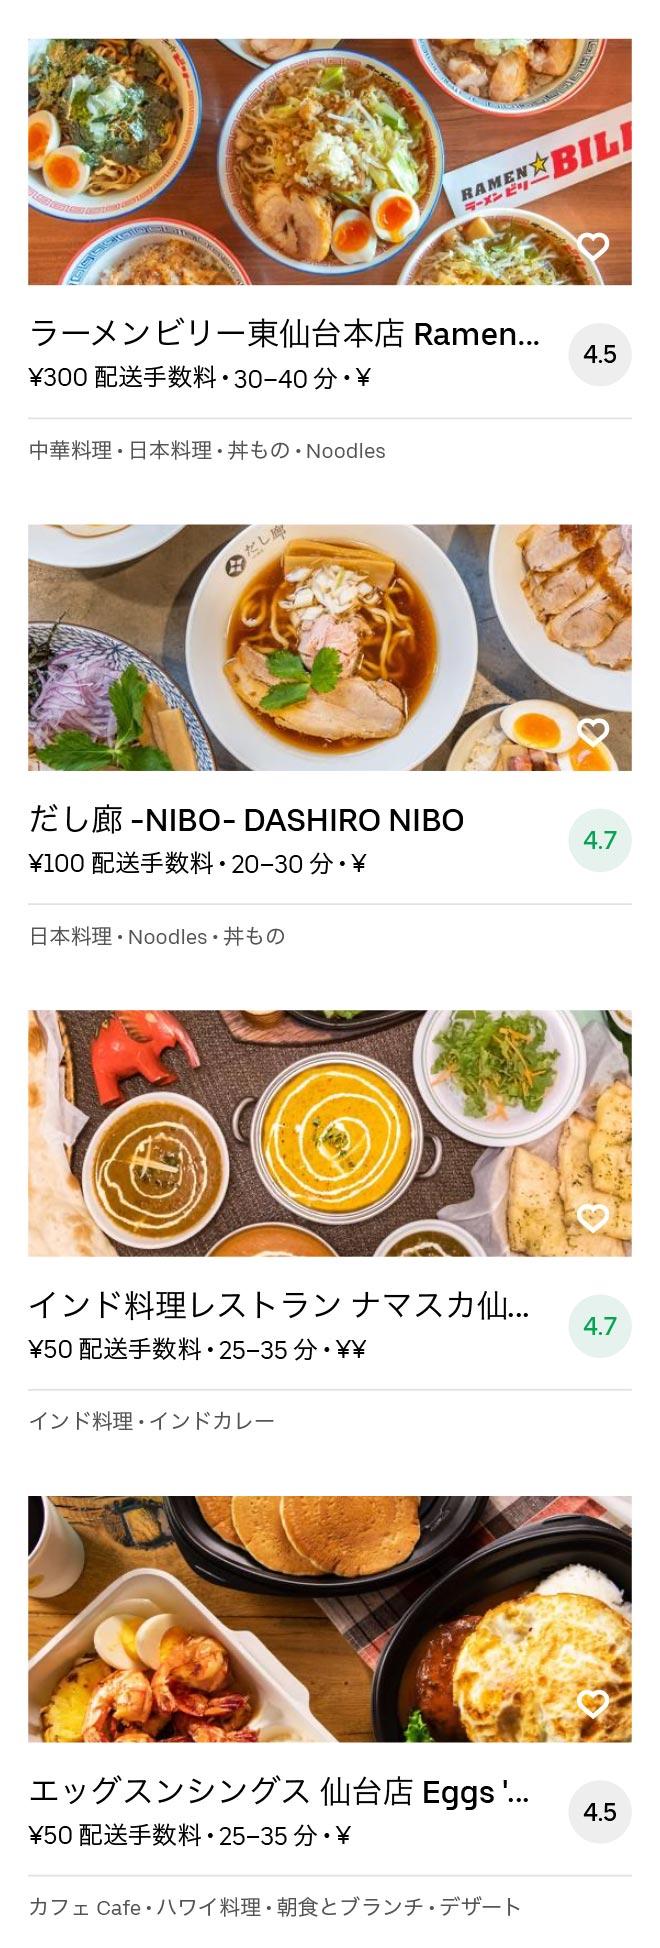 Sendai menu 2008 09